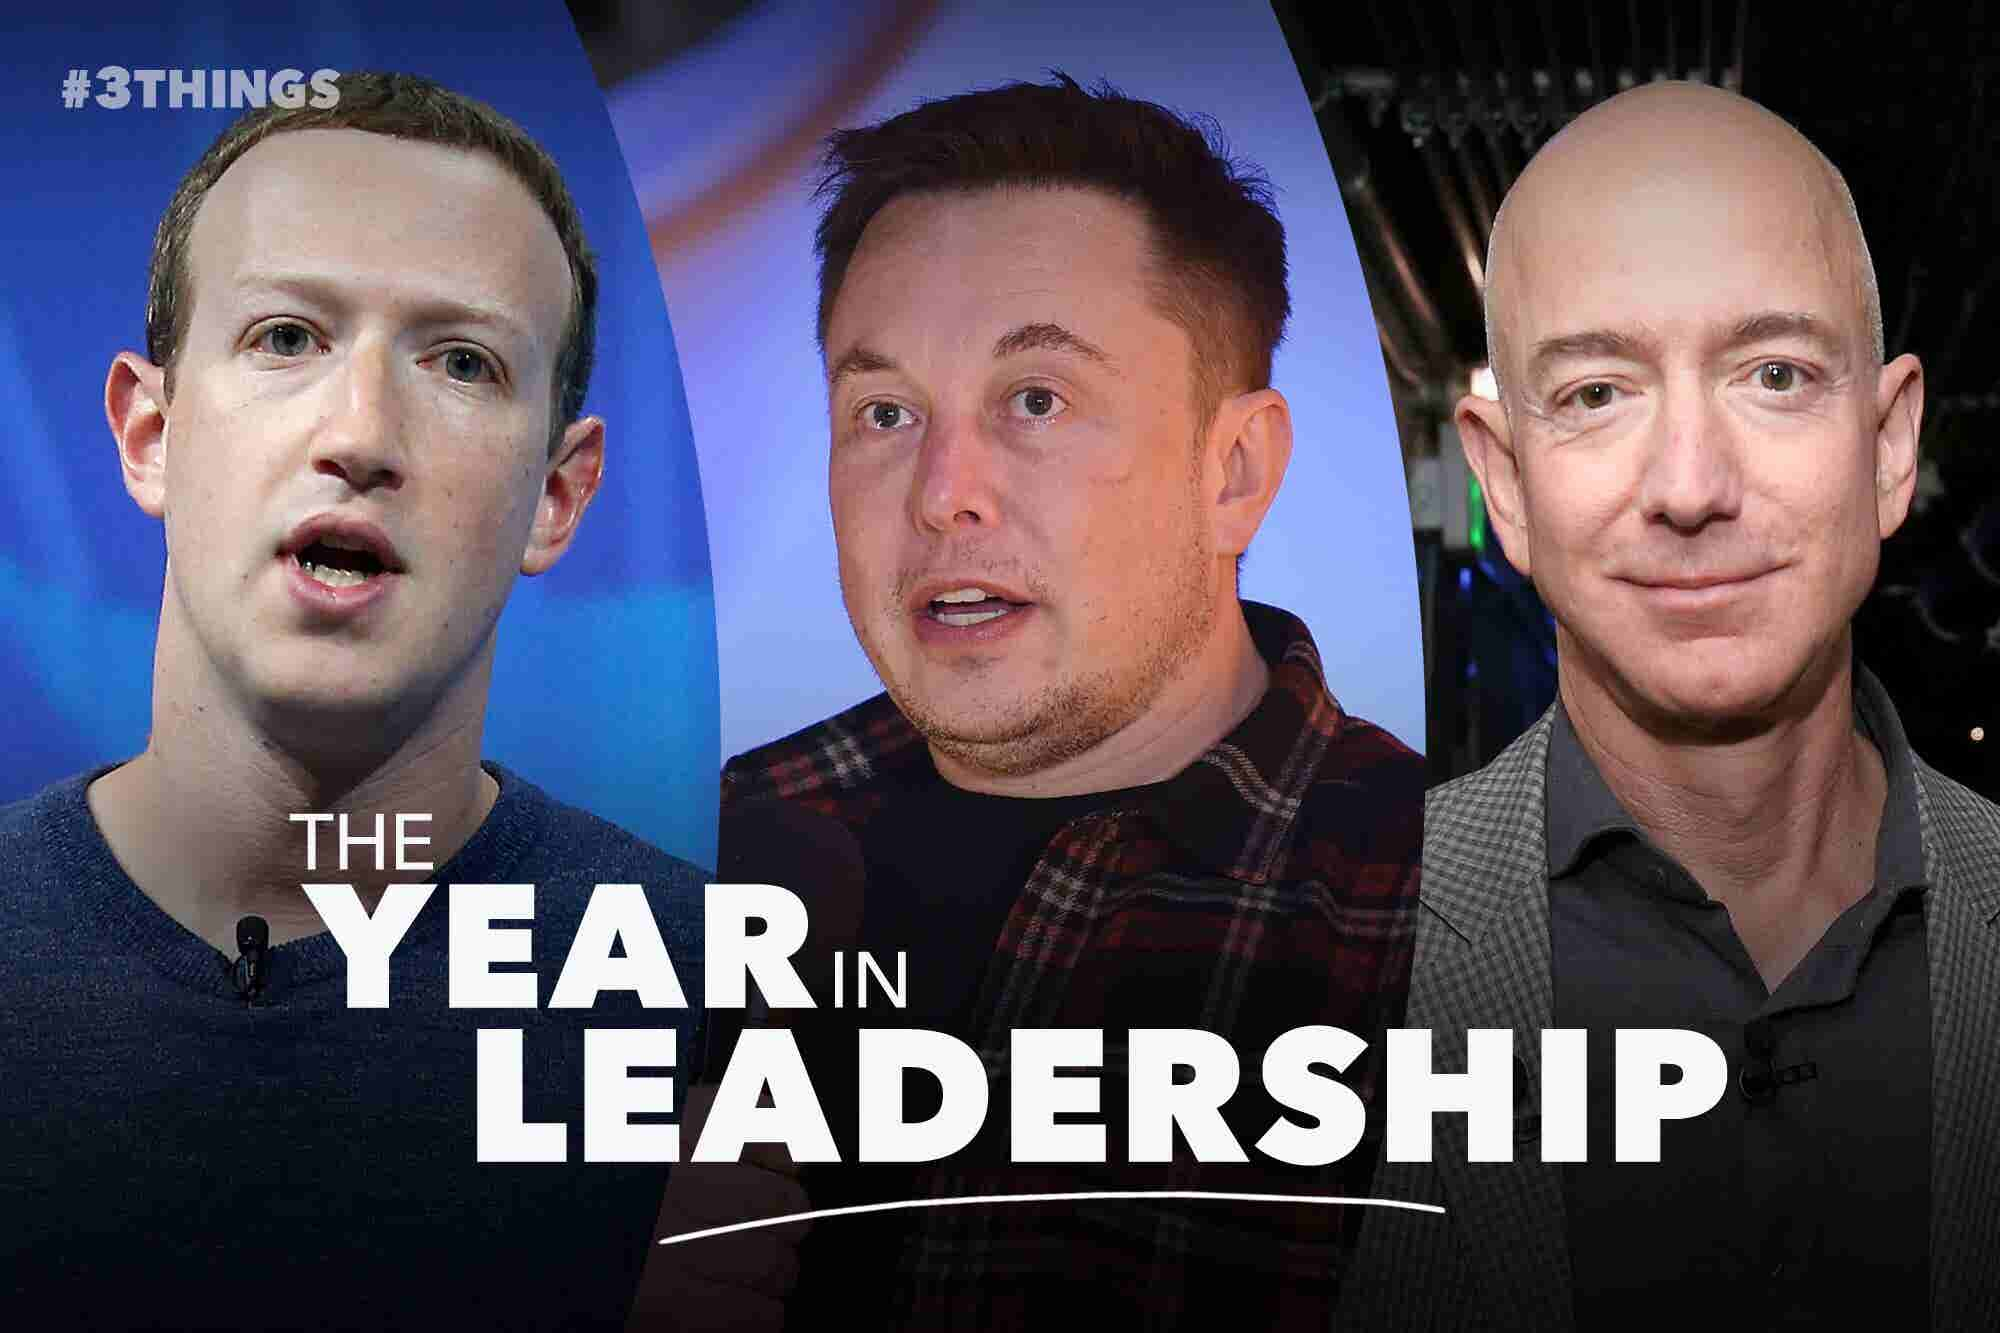 Mark Zuckerberg, Elon Musk and Jeff Bezos: For Each, a Vastly Differen...